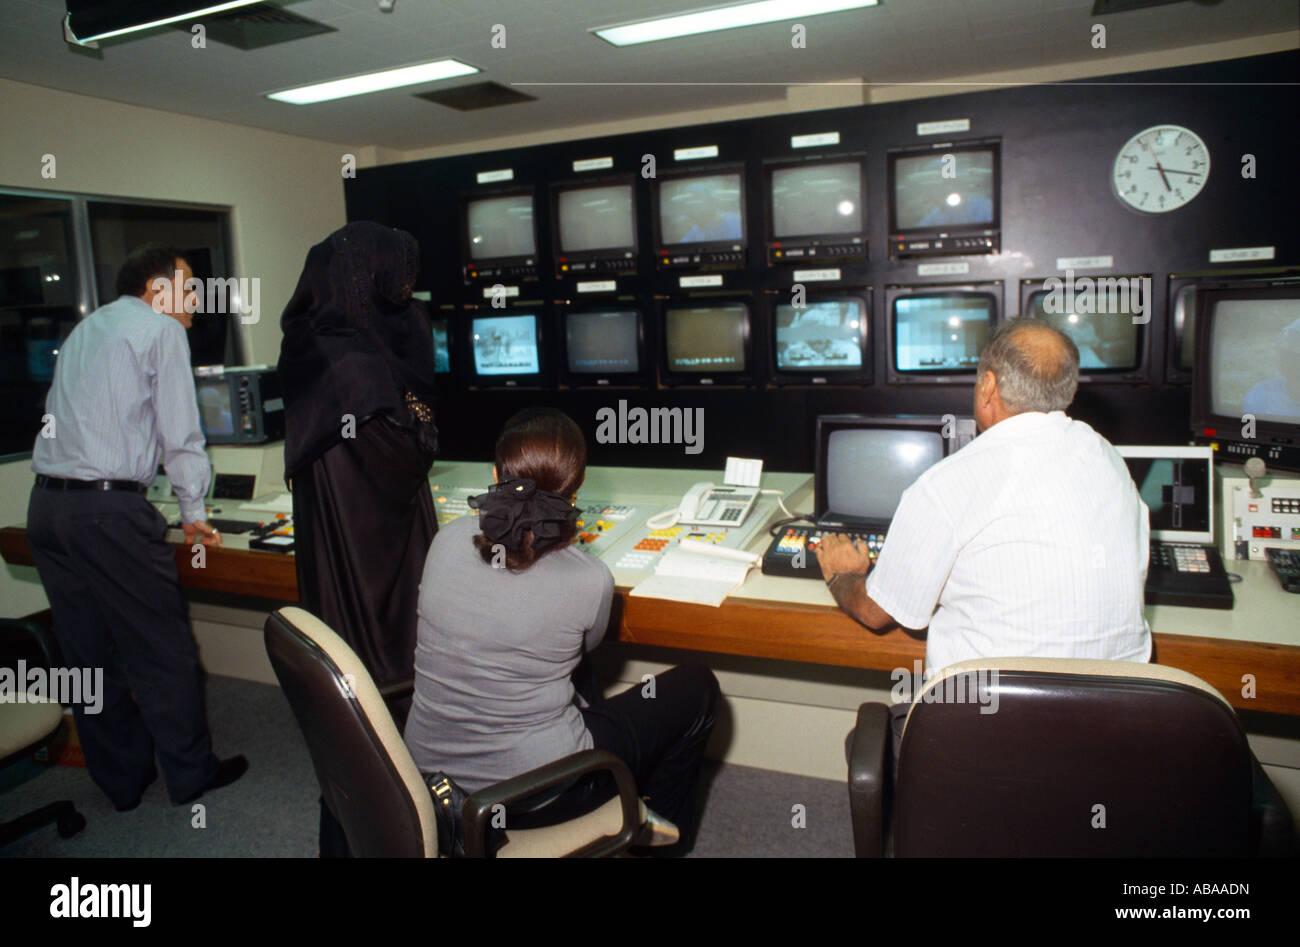 Dubai UAE Television Satellite Channel Control Room Stock Photo ...